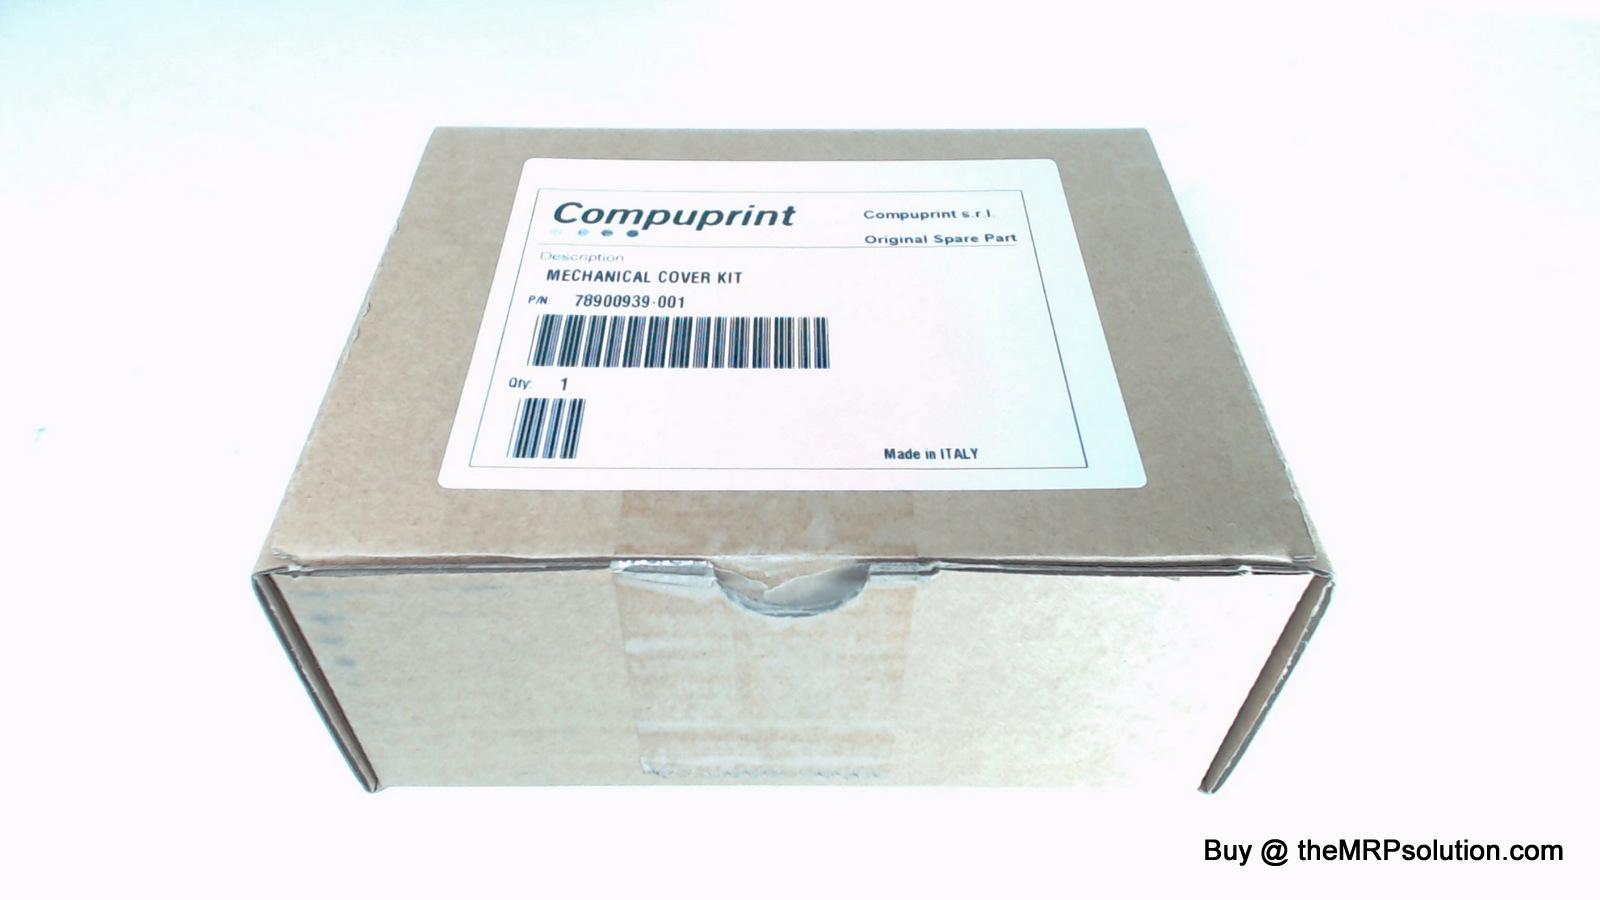 COMPUPRINT 78900939-001 MECHANICAL COVER KIT Refurbished